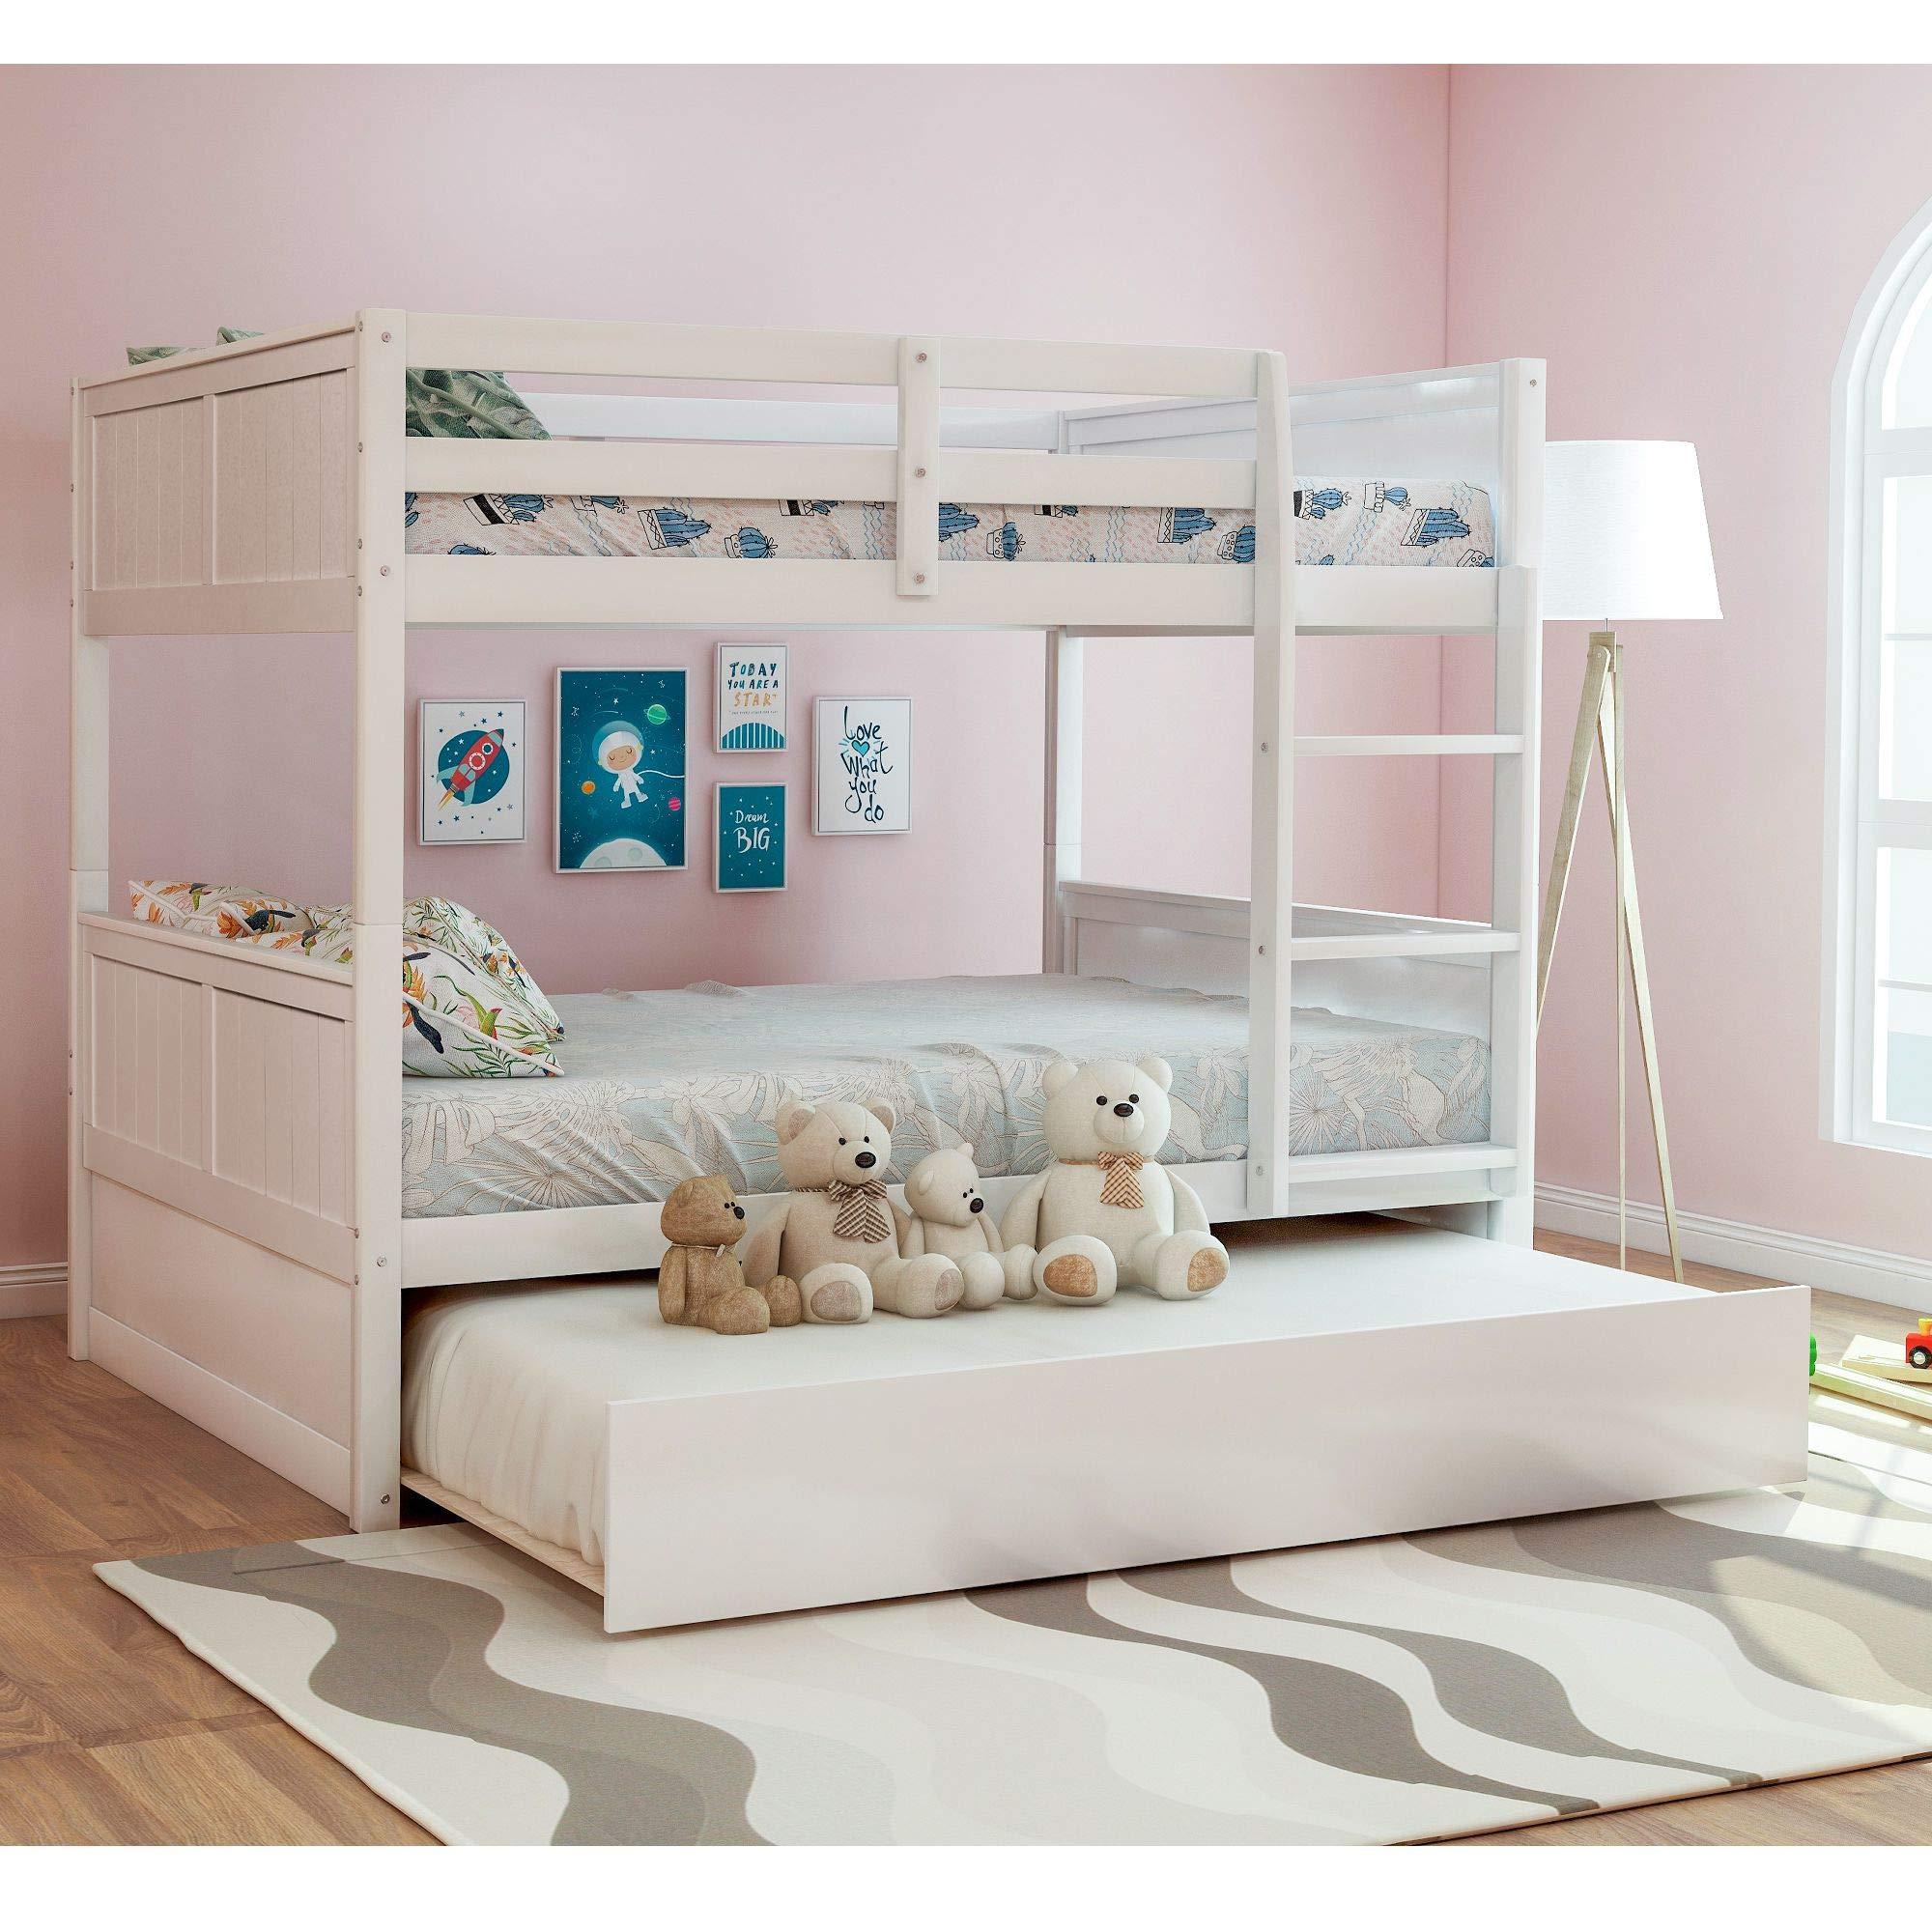 Full Over Full Bunk Bed For Kids Trundle Bed Loft System With Steps Crisp White Buy Online In Botswana At Botswana Desertcart Com Productid 169517467